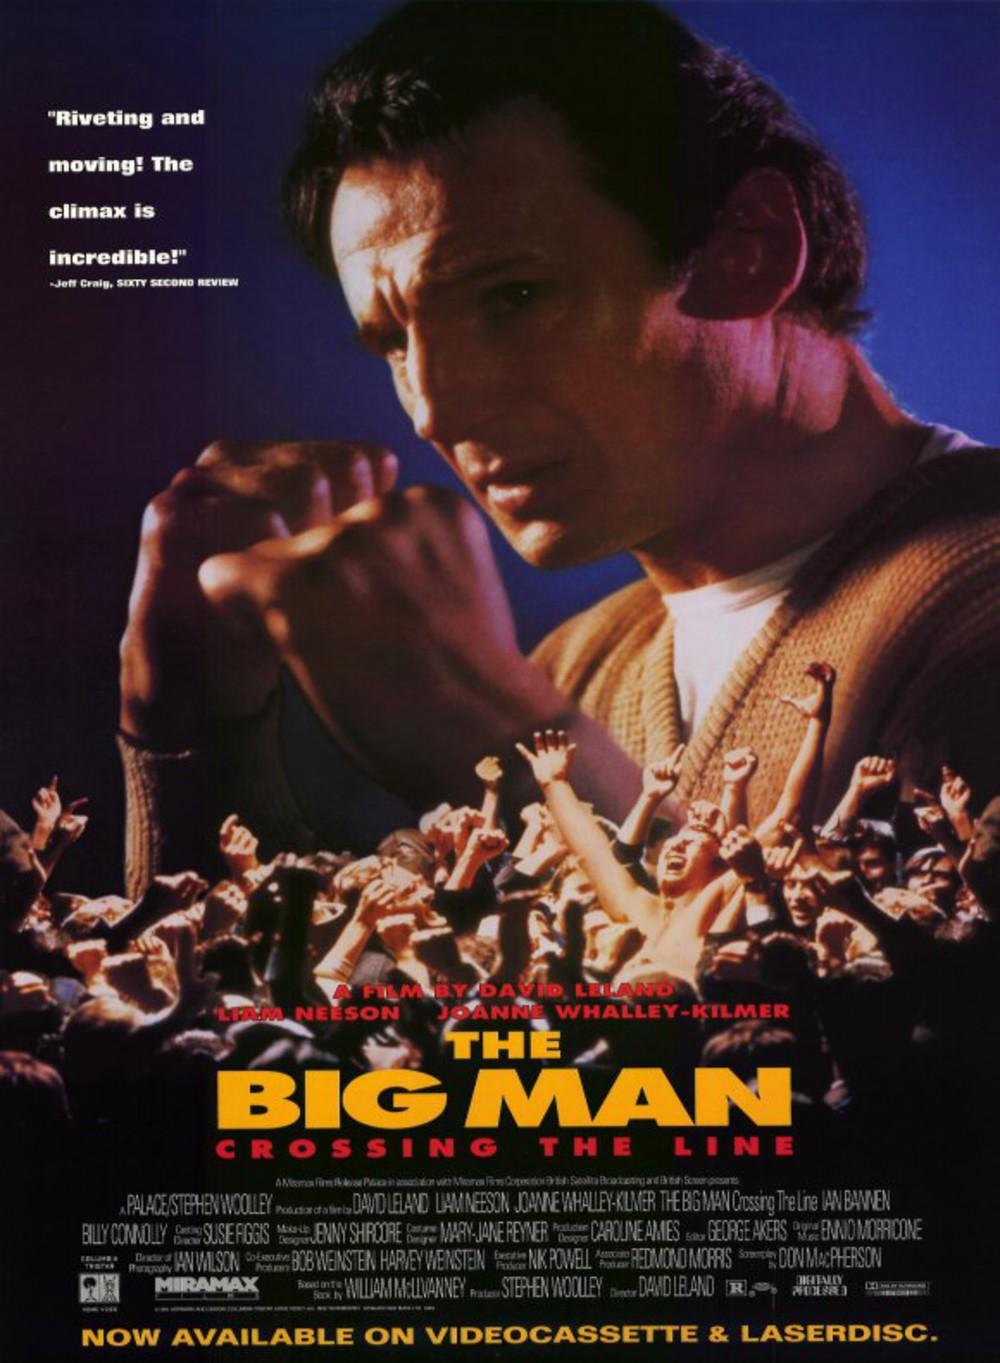 affiche du film The Big Man